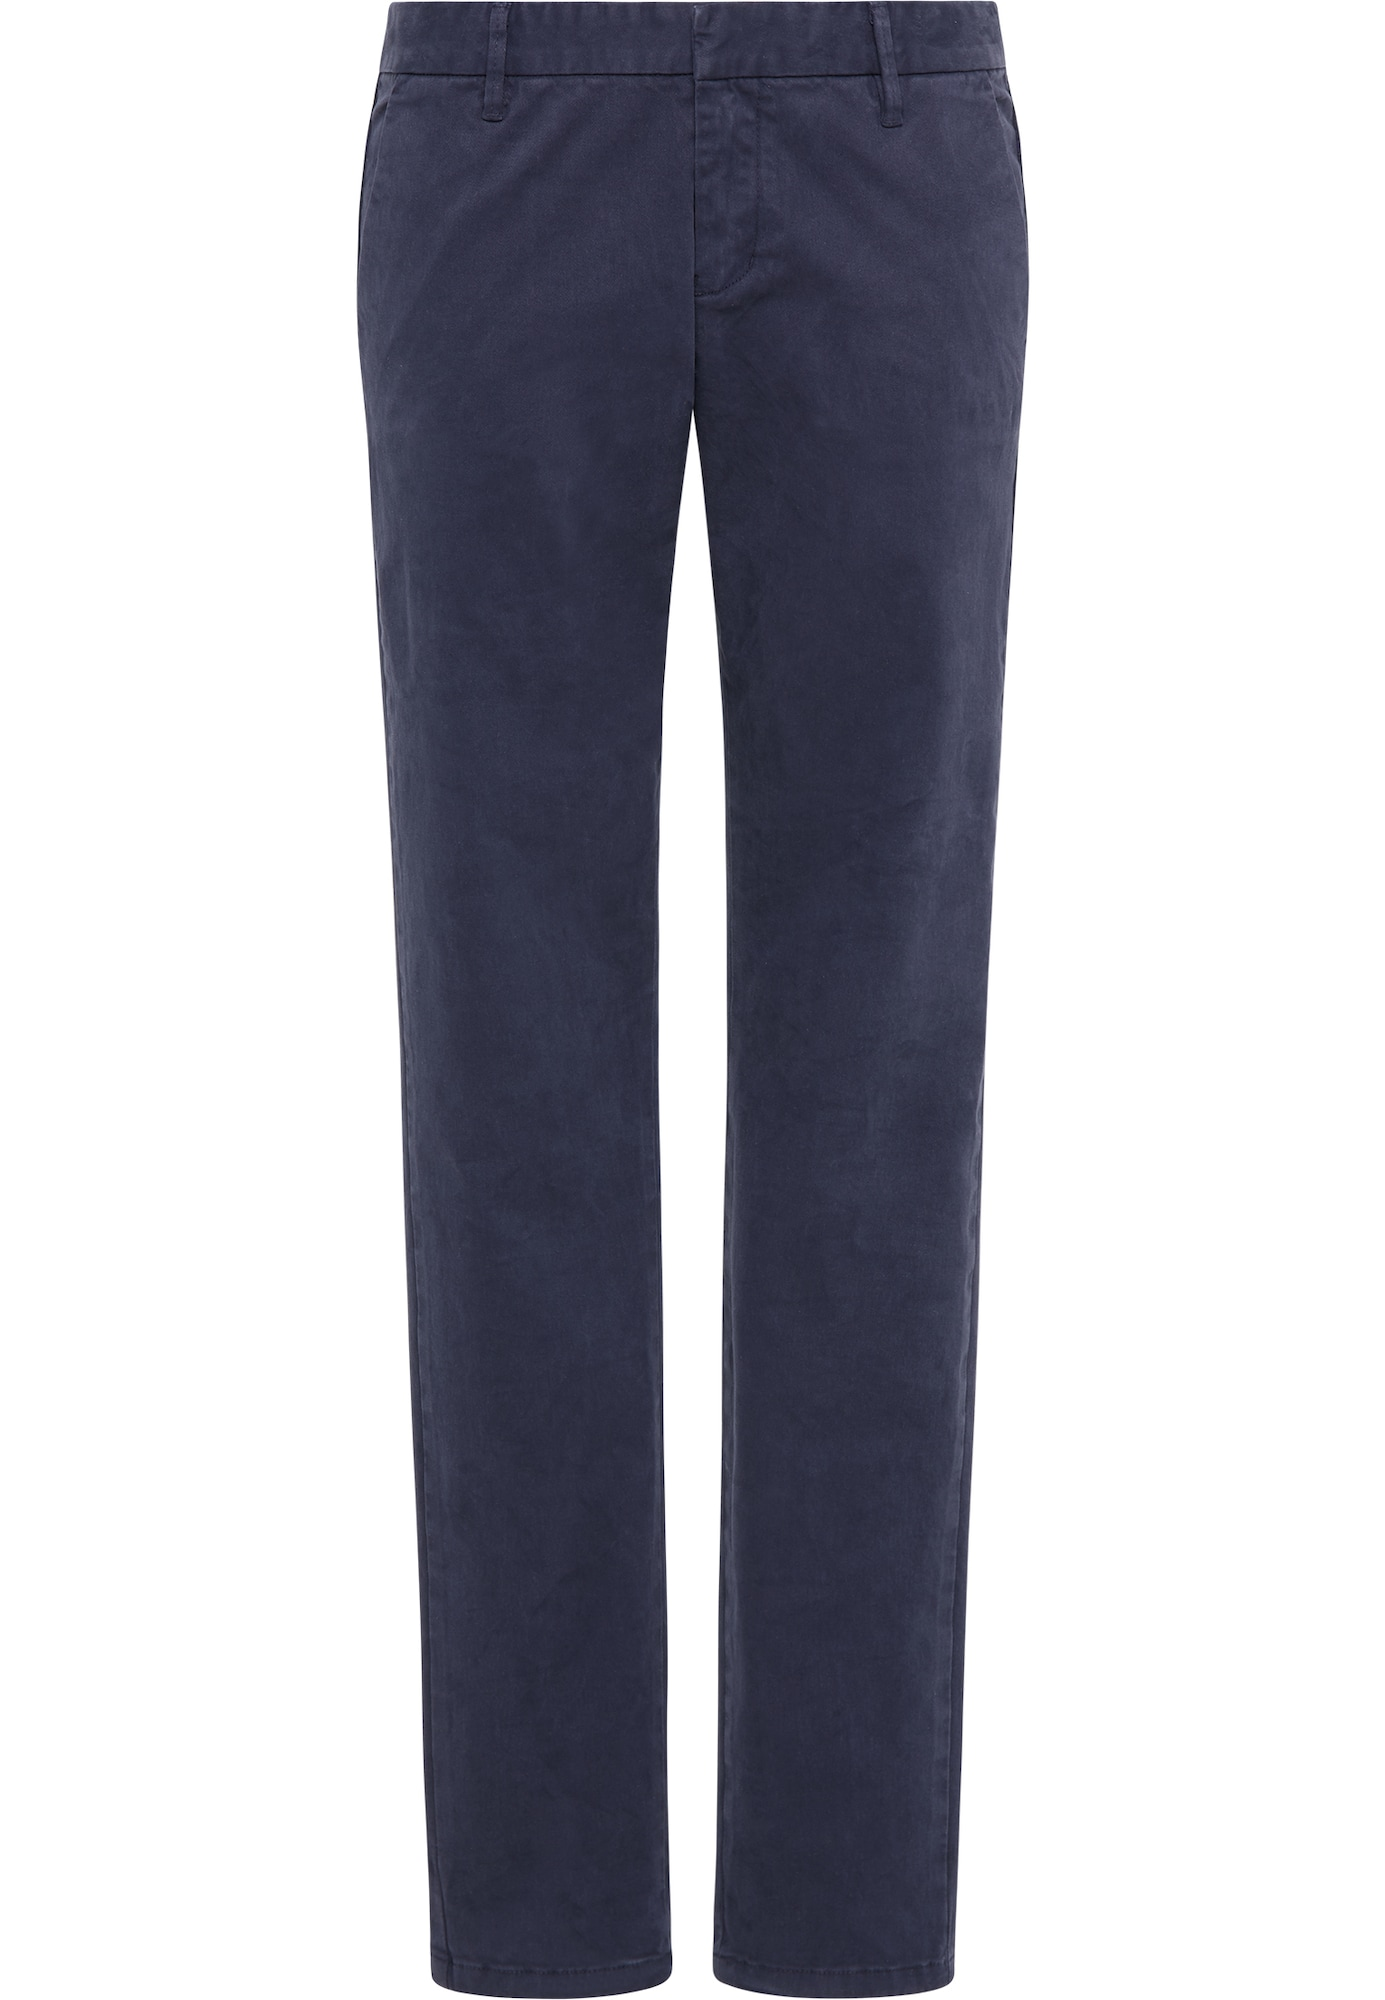 DreiMaster Vintage Kelnės tamsiai mėlyna